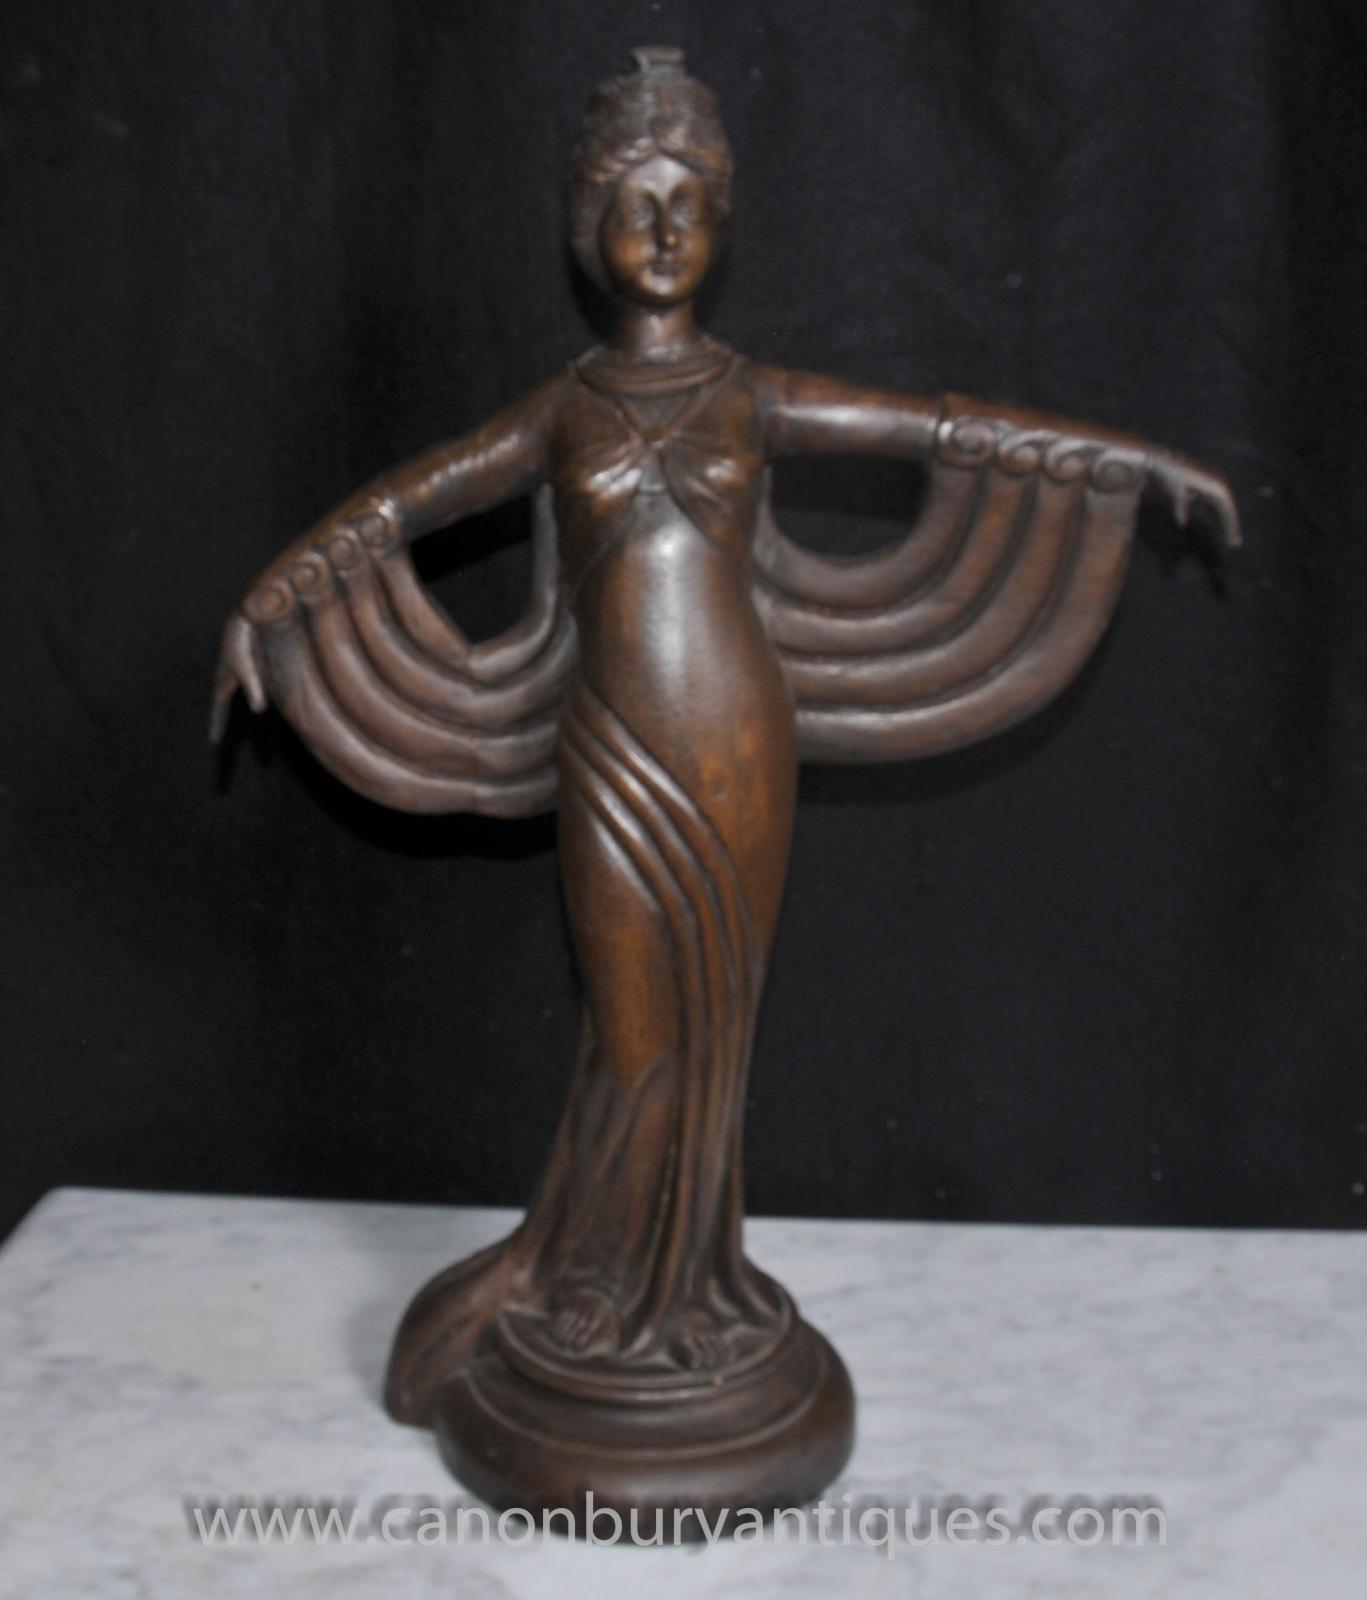 hand carved french art deco figurine statue ebay. Black Bedroom Furniture Sets. Home Design Ideas